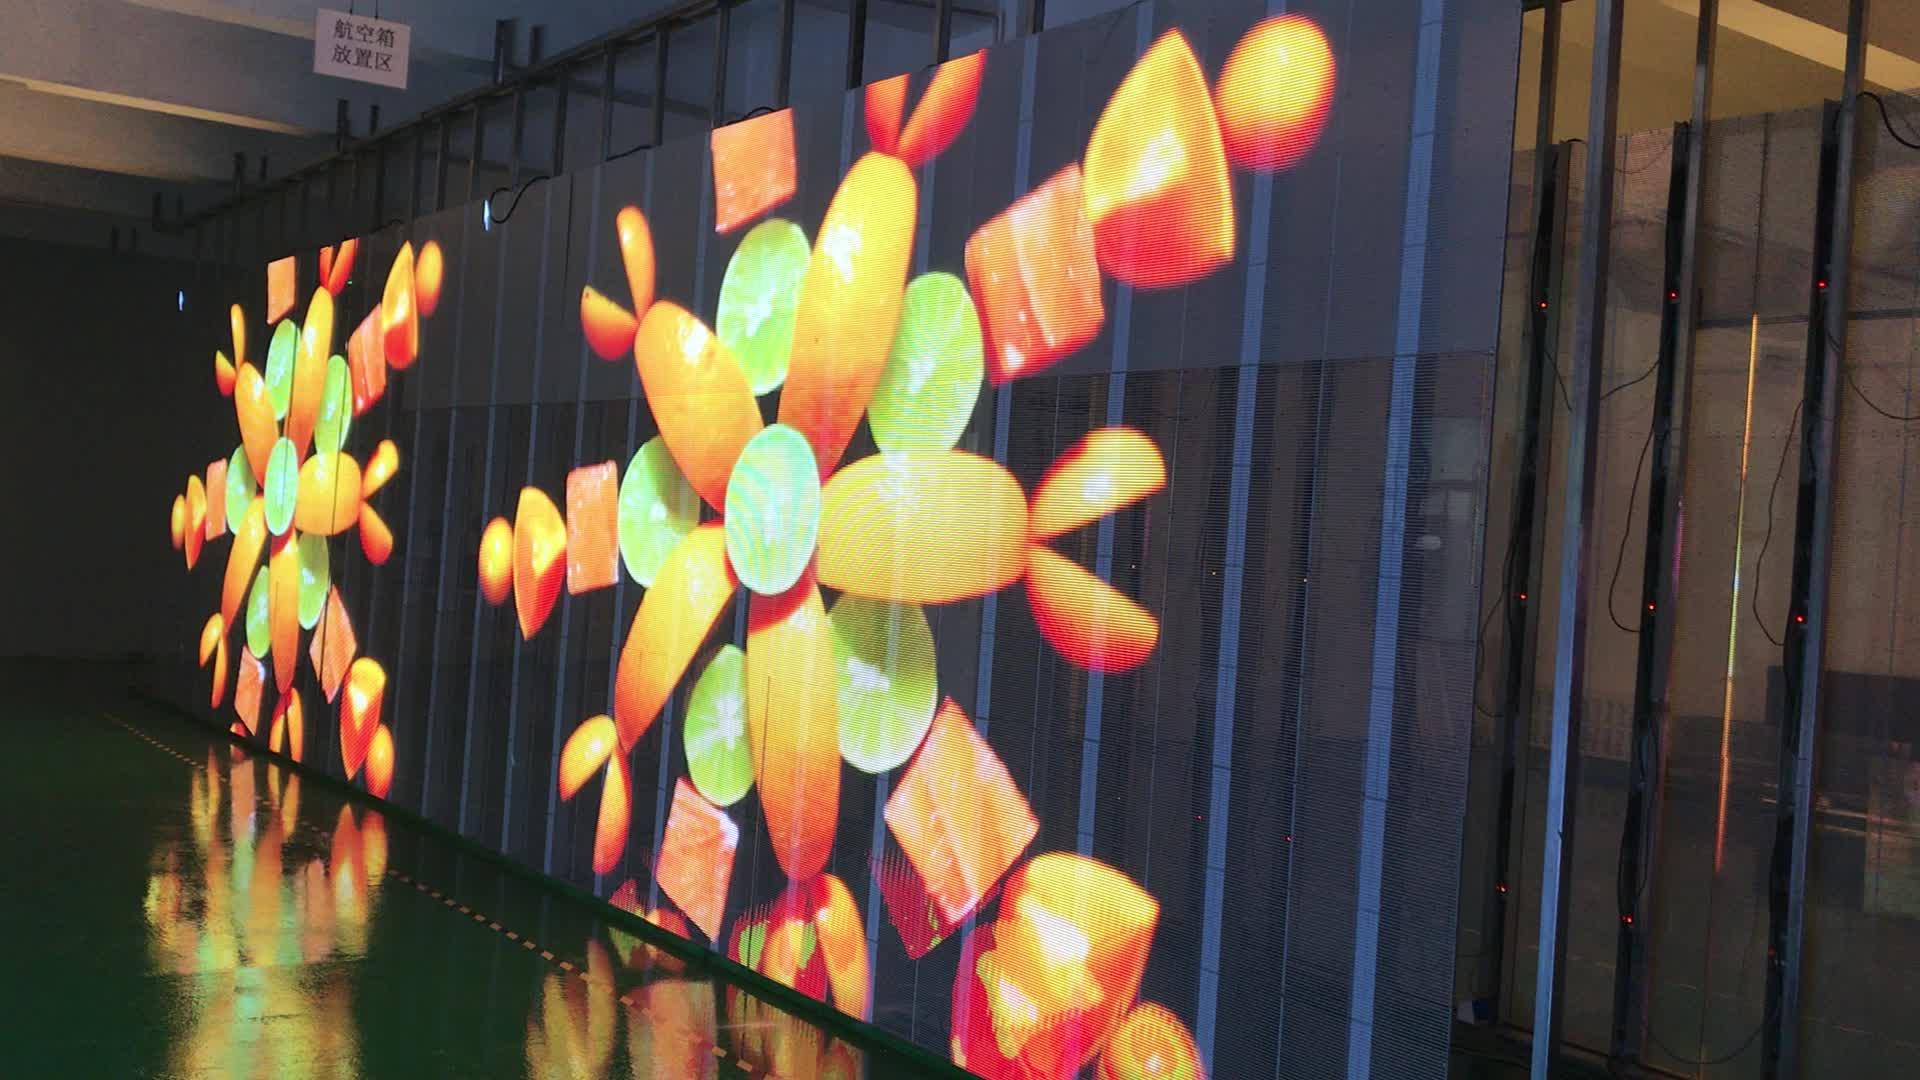 Yeni P3 Ultra hafif vitrin şeffaf LED Video paneli duvar